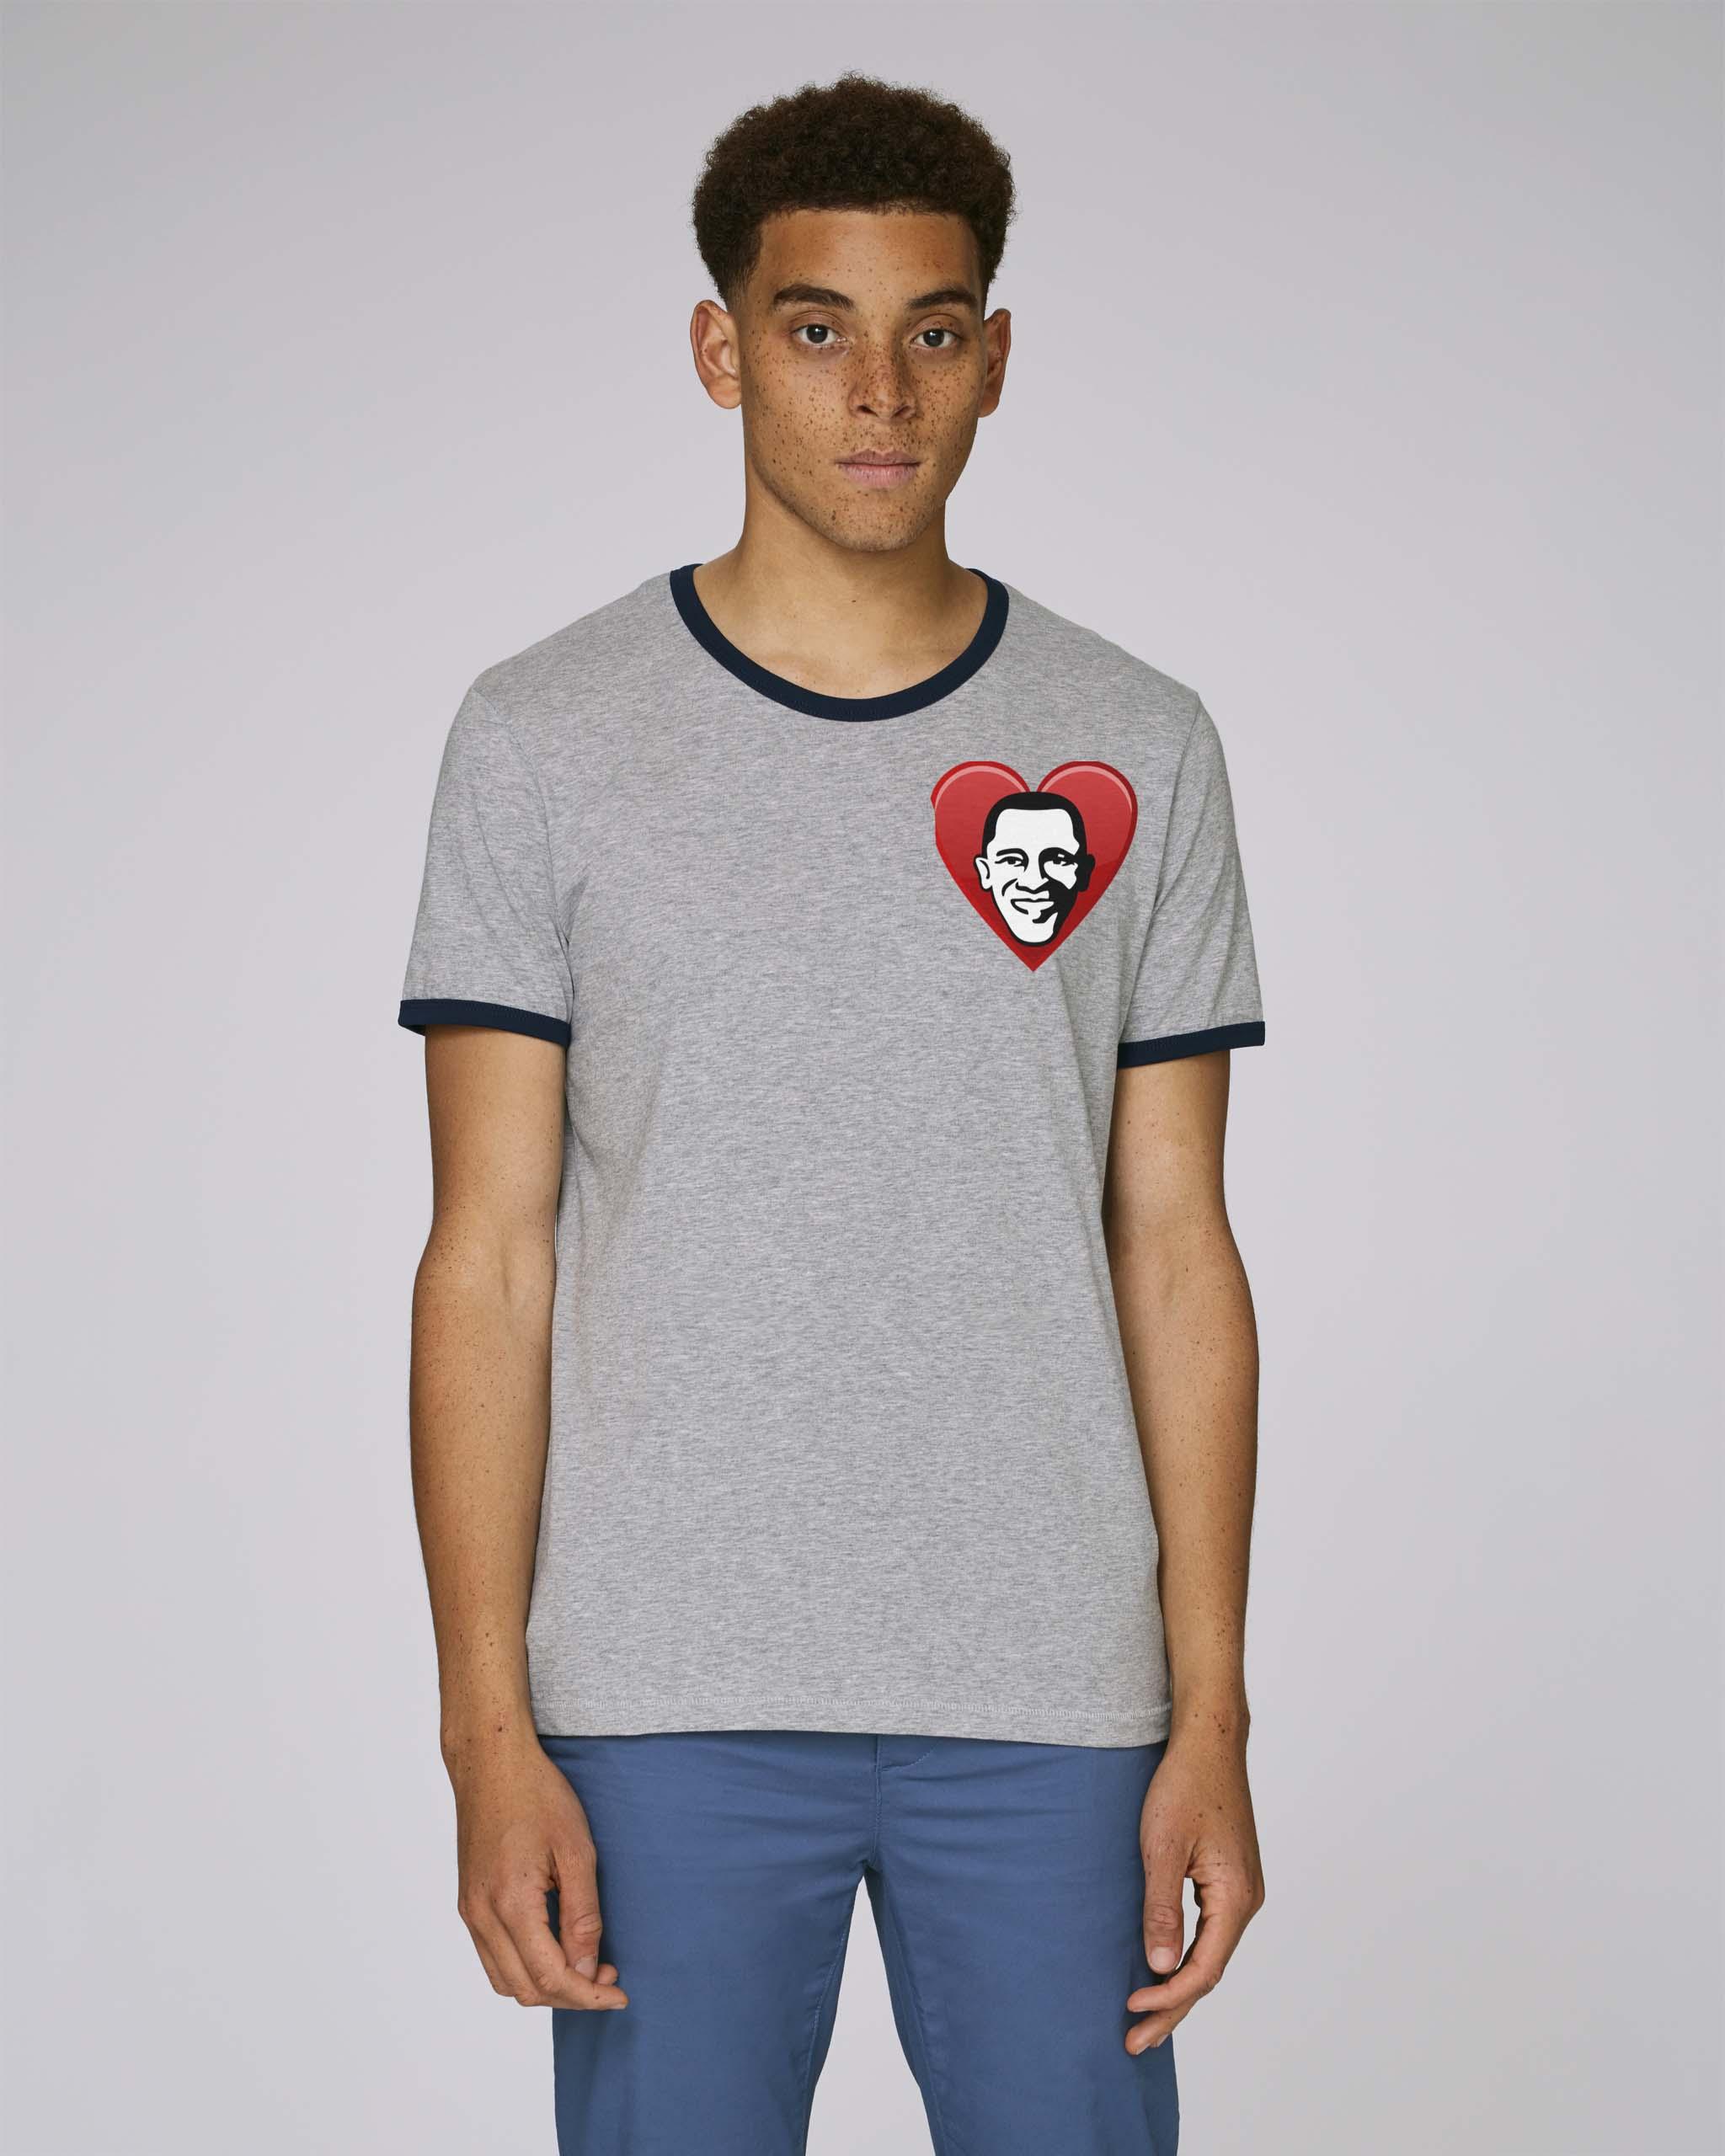 T-Shirt Bio gris Homme - Obama tee